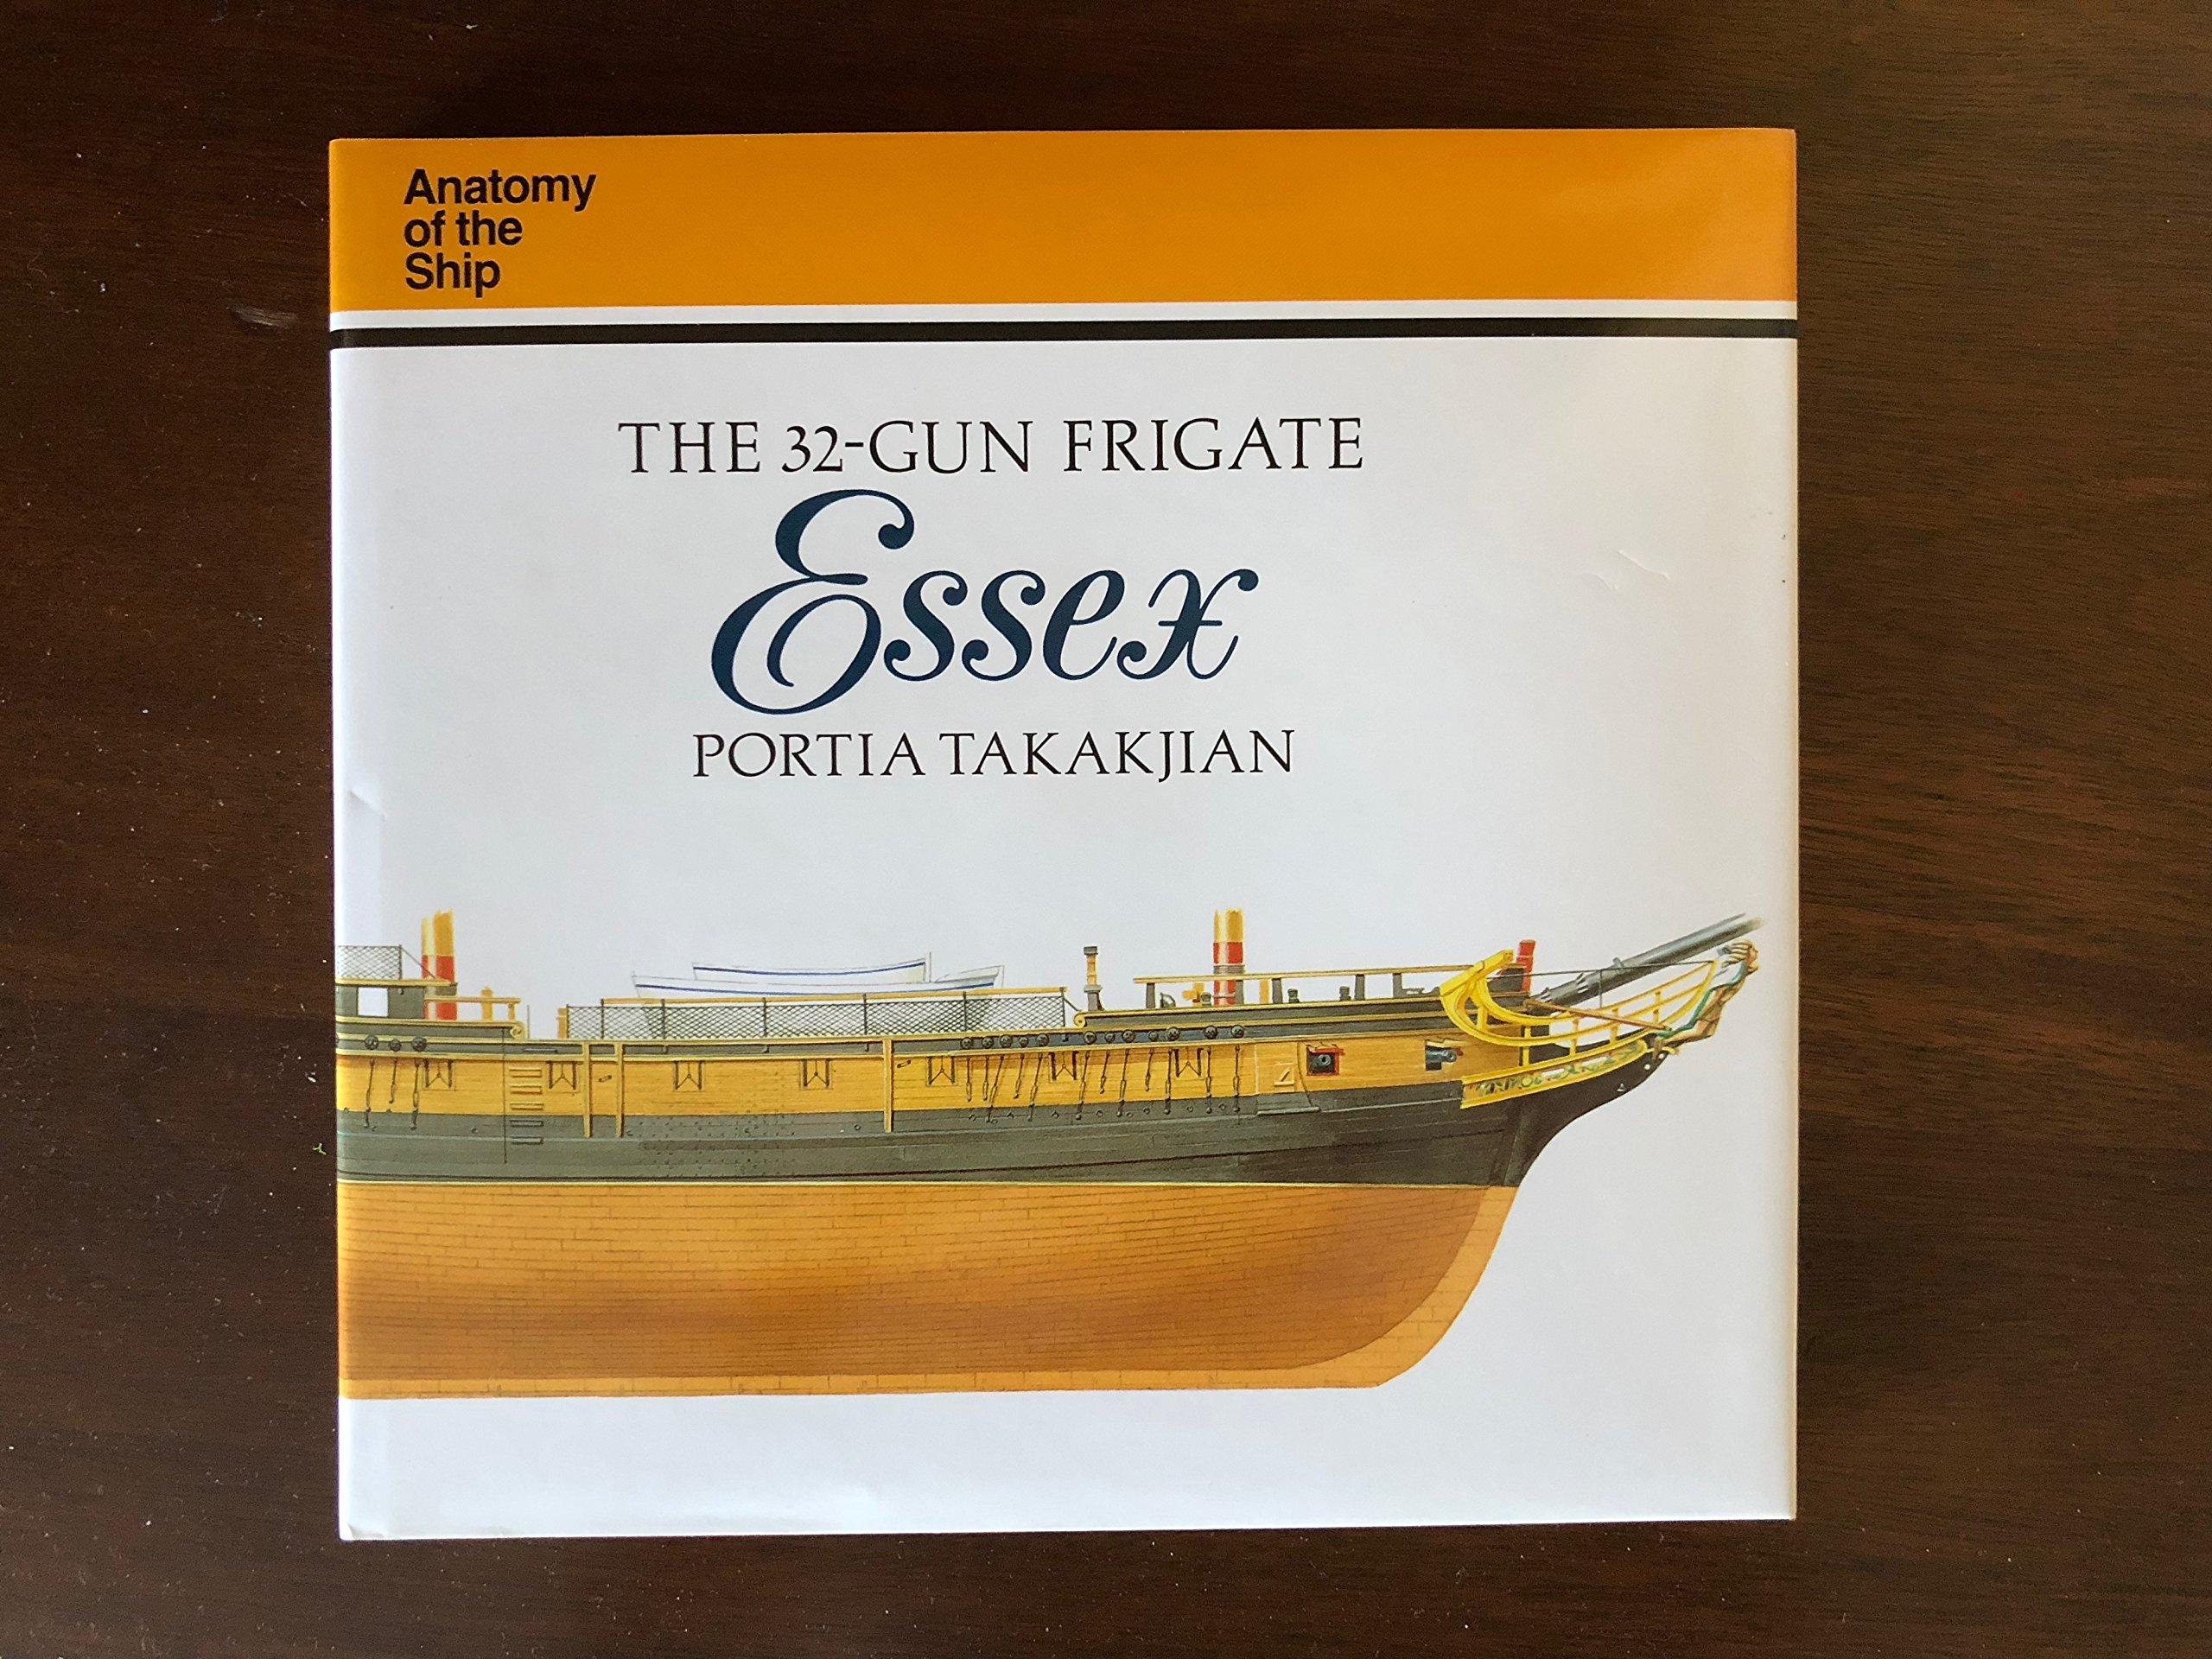 32 Gun Frigate Essex Anatomy Of The Ship Portia Takakjian